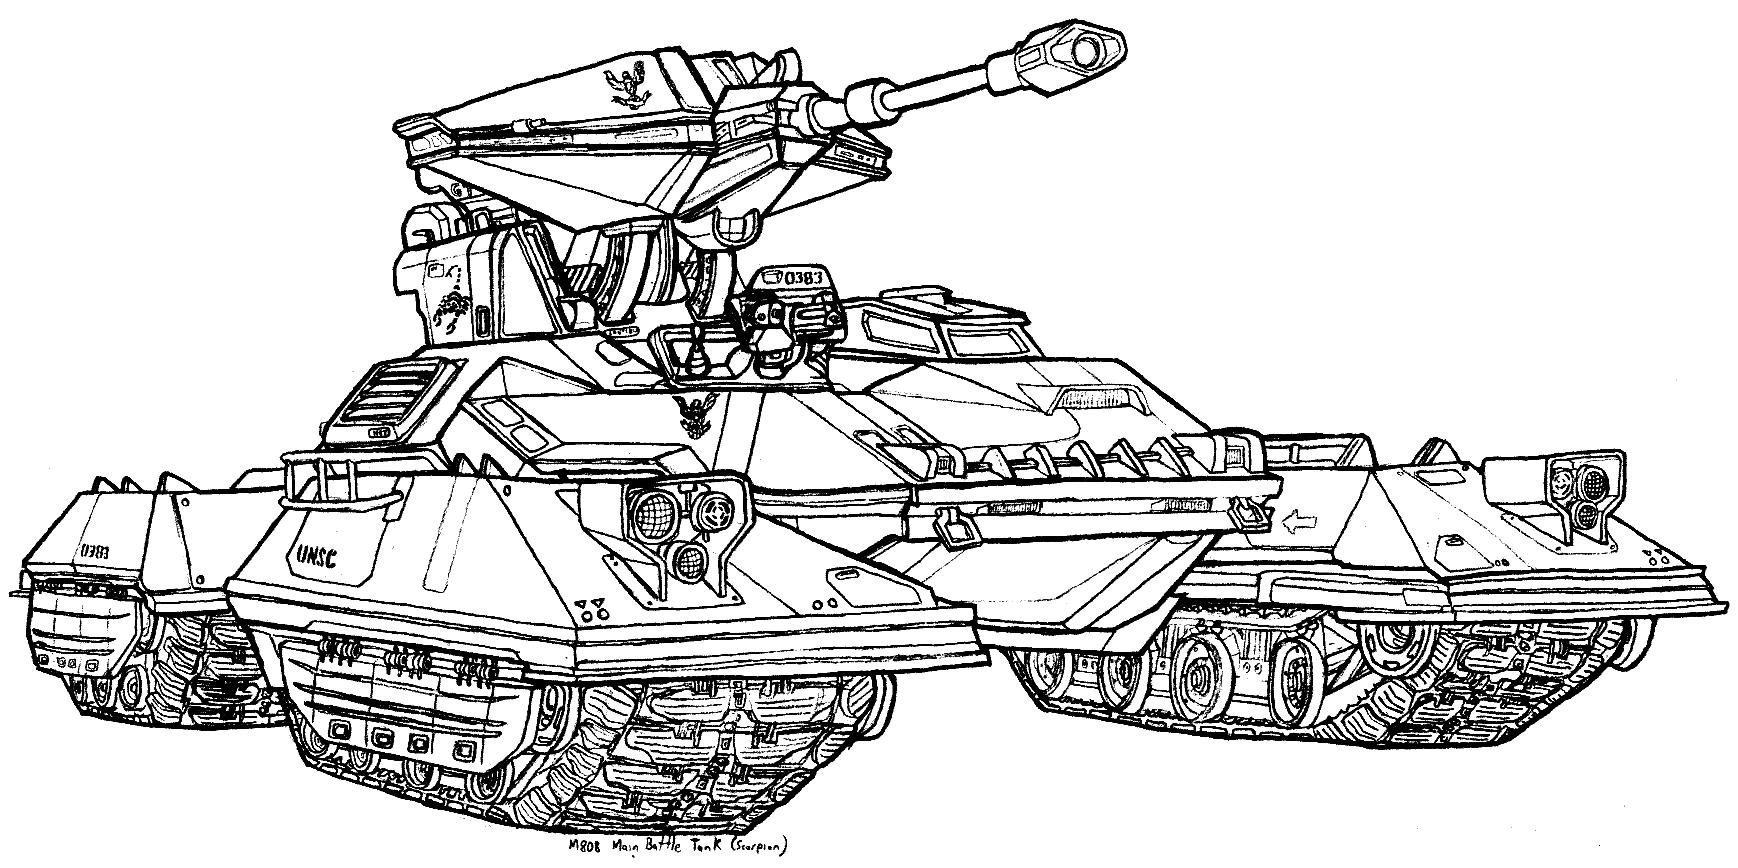 M808 main battle tank scorpion by dandelo1 on deviantart for Tank coloring page